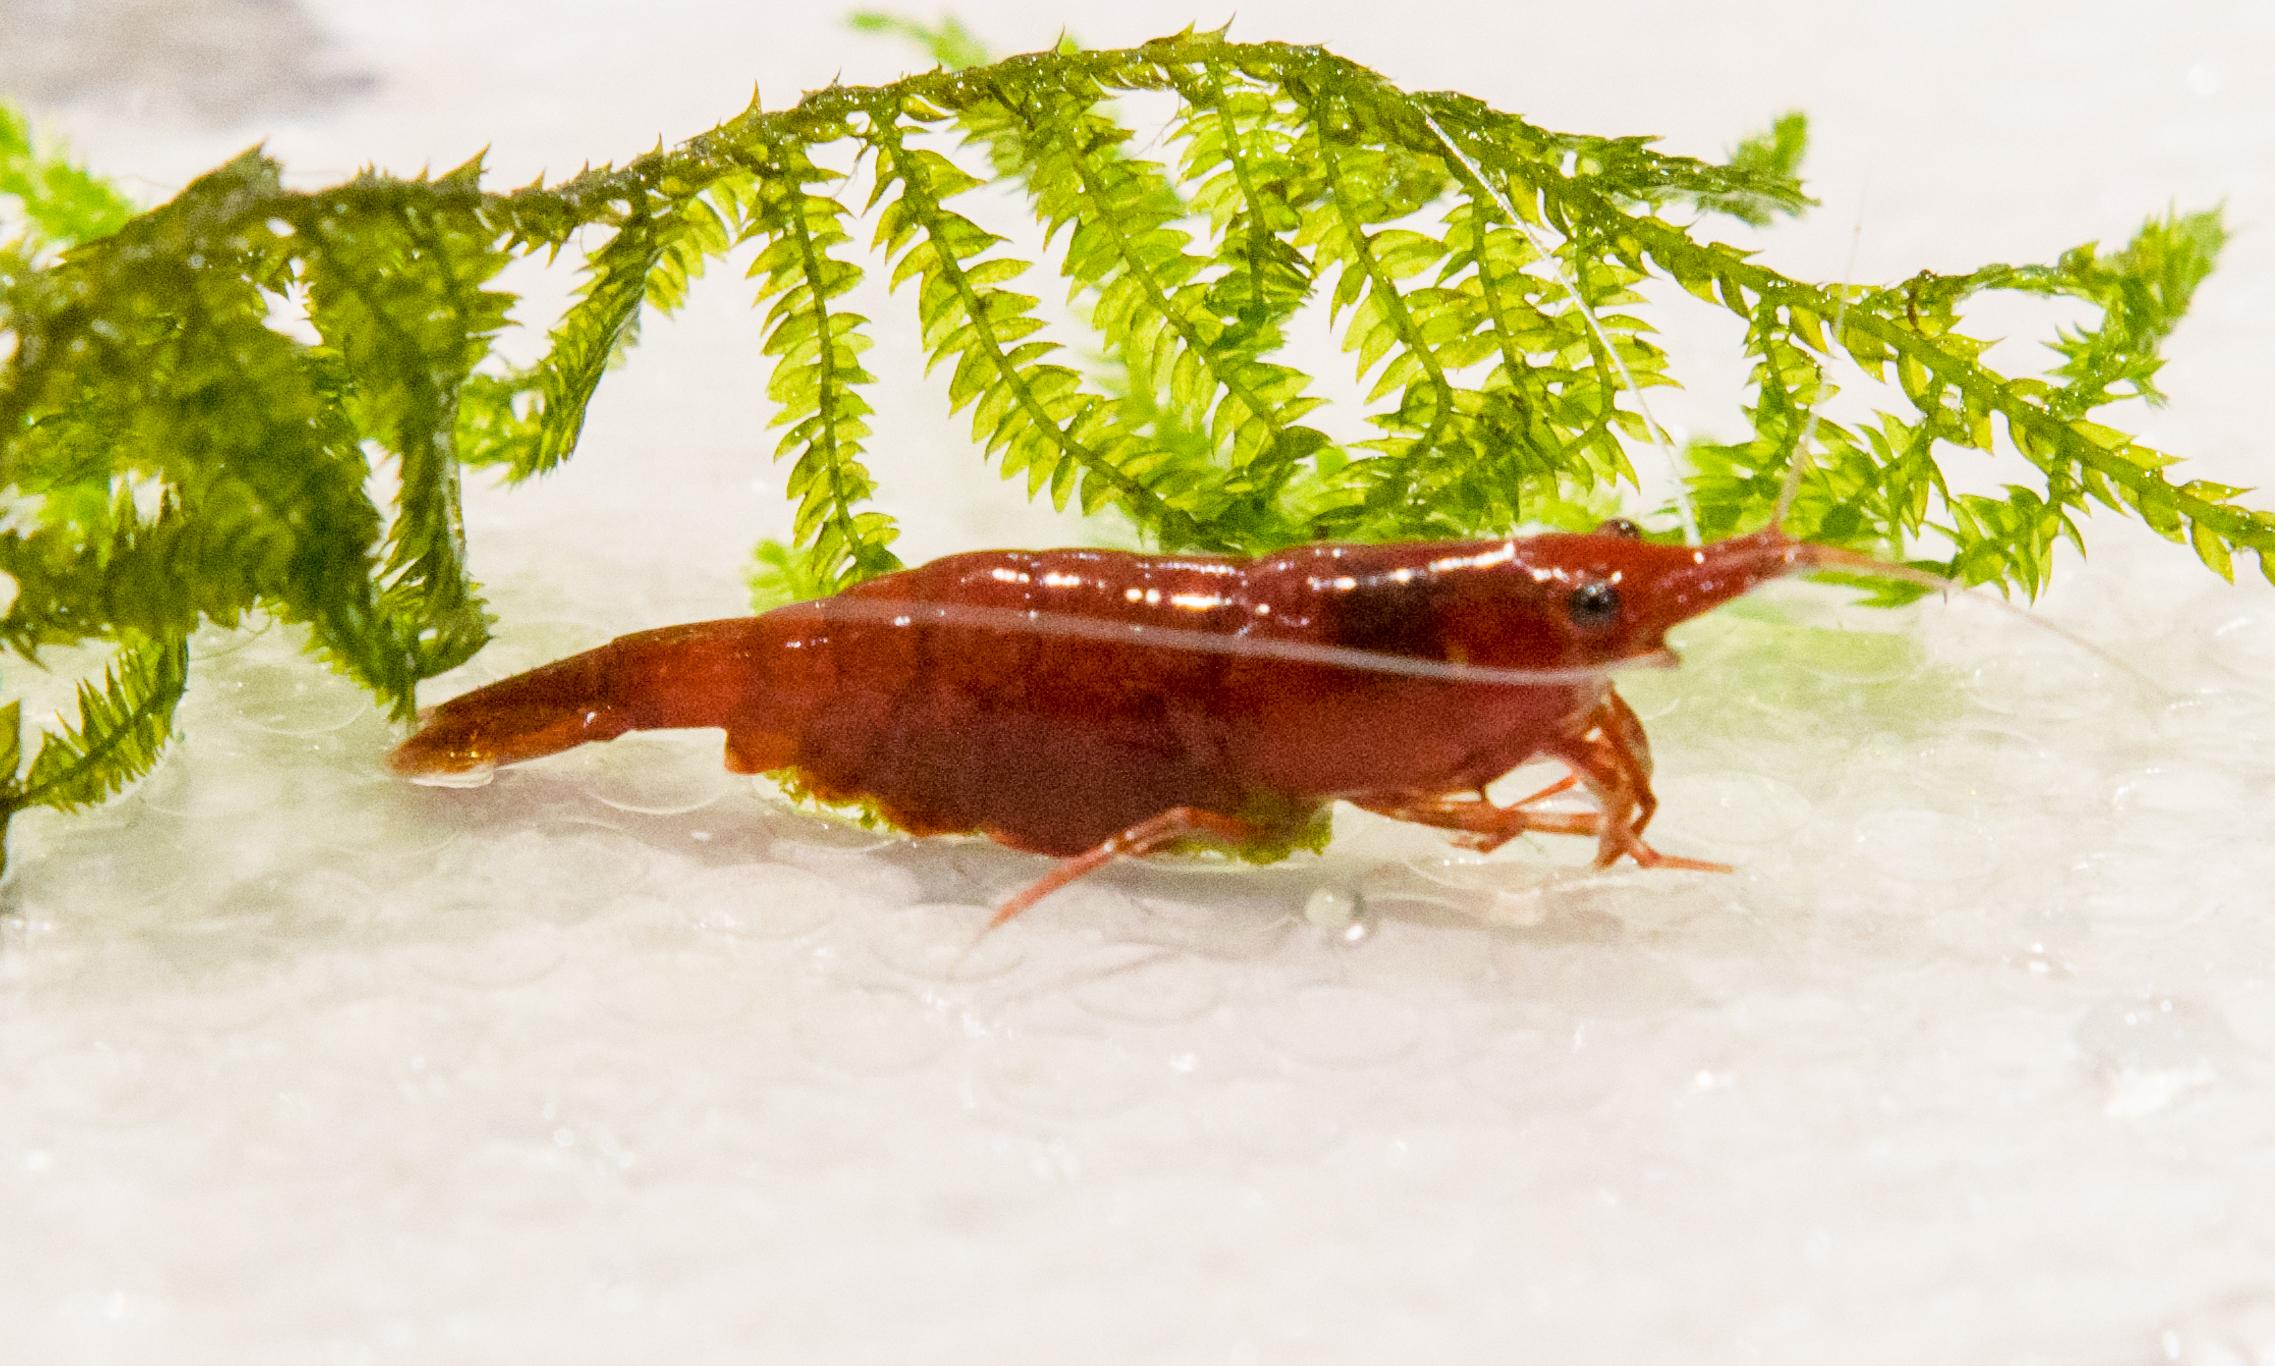 7408 - Dec 26 Ellobiopsidae or not.jpg